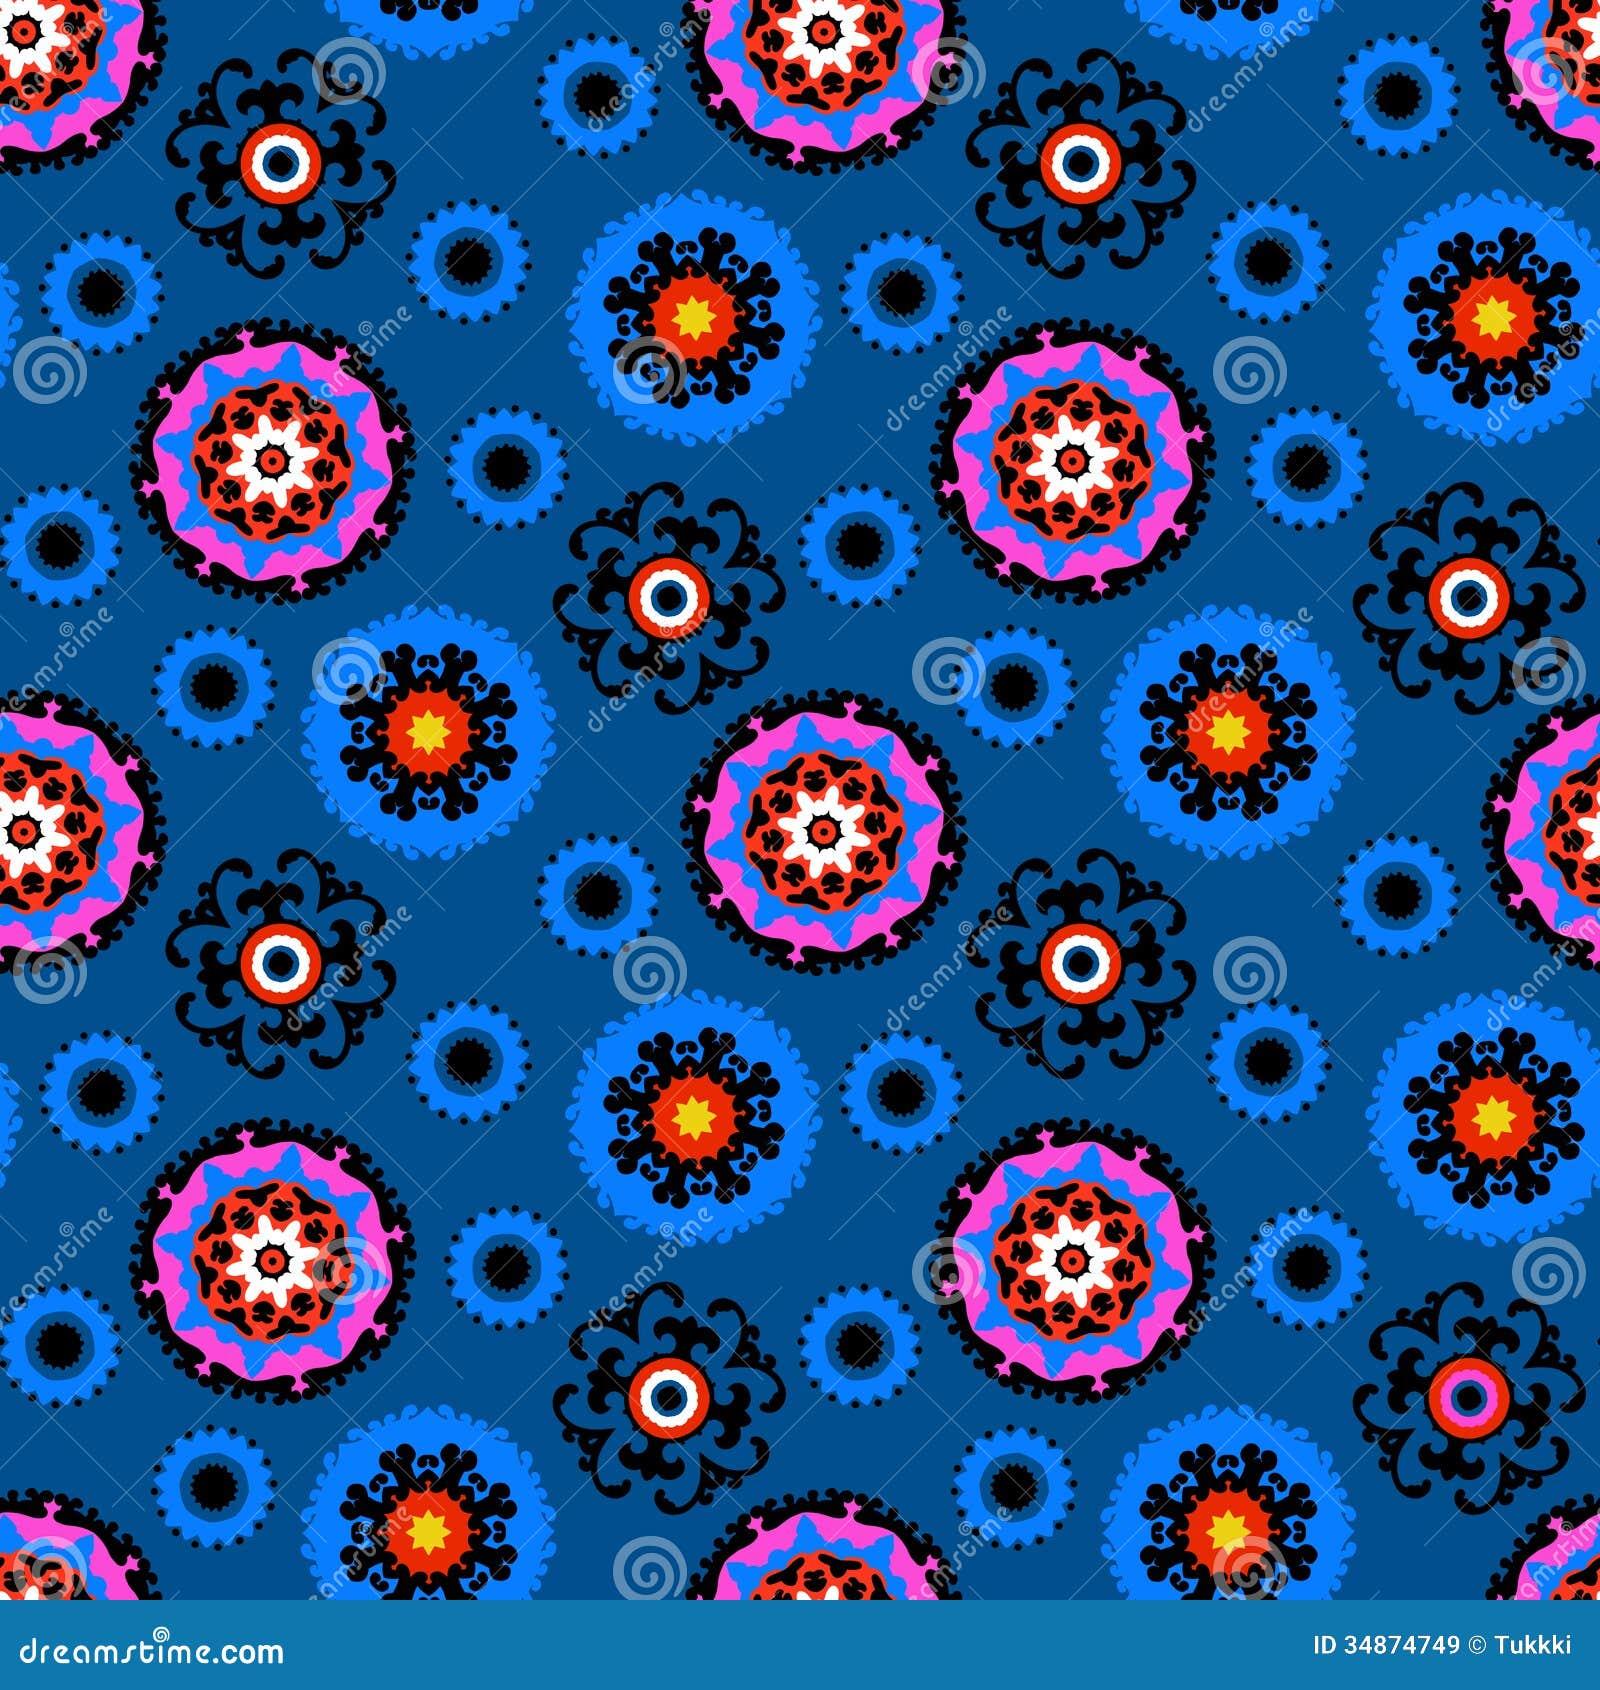 Suzani Pattern Royalty Free Stock Images Image 34874749